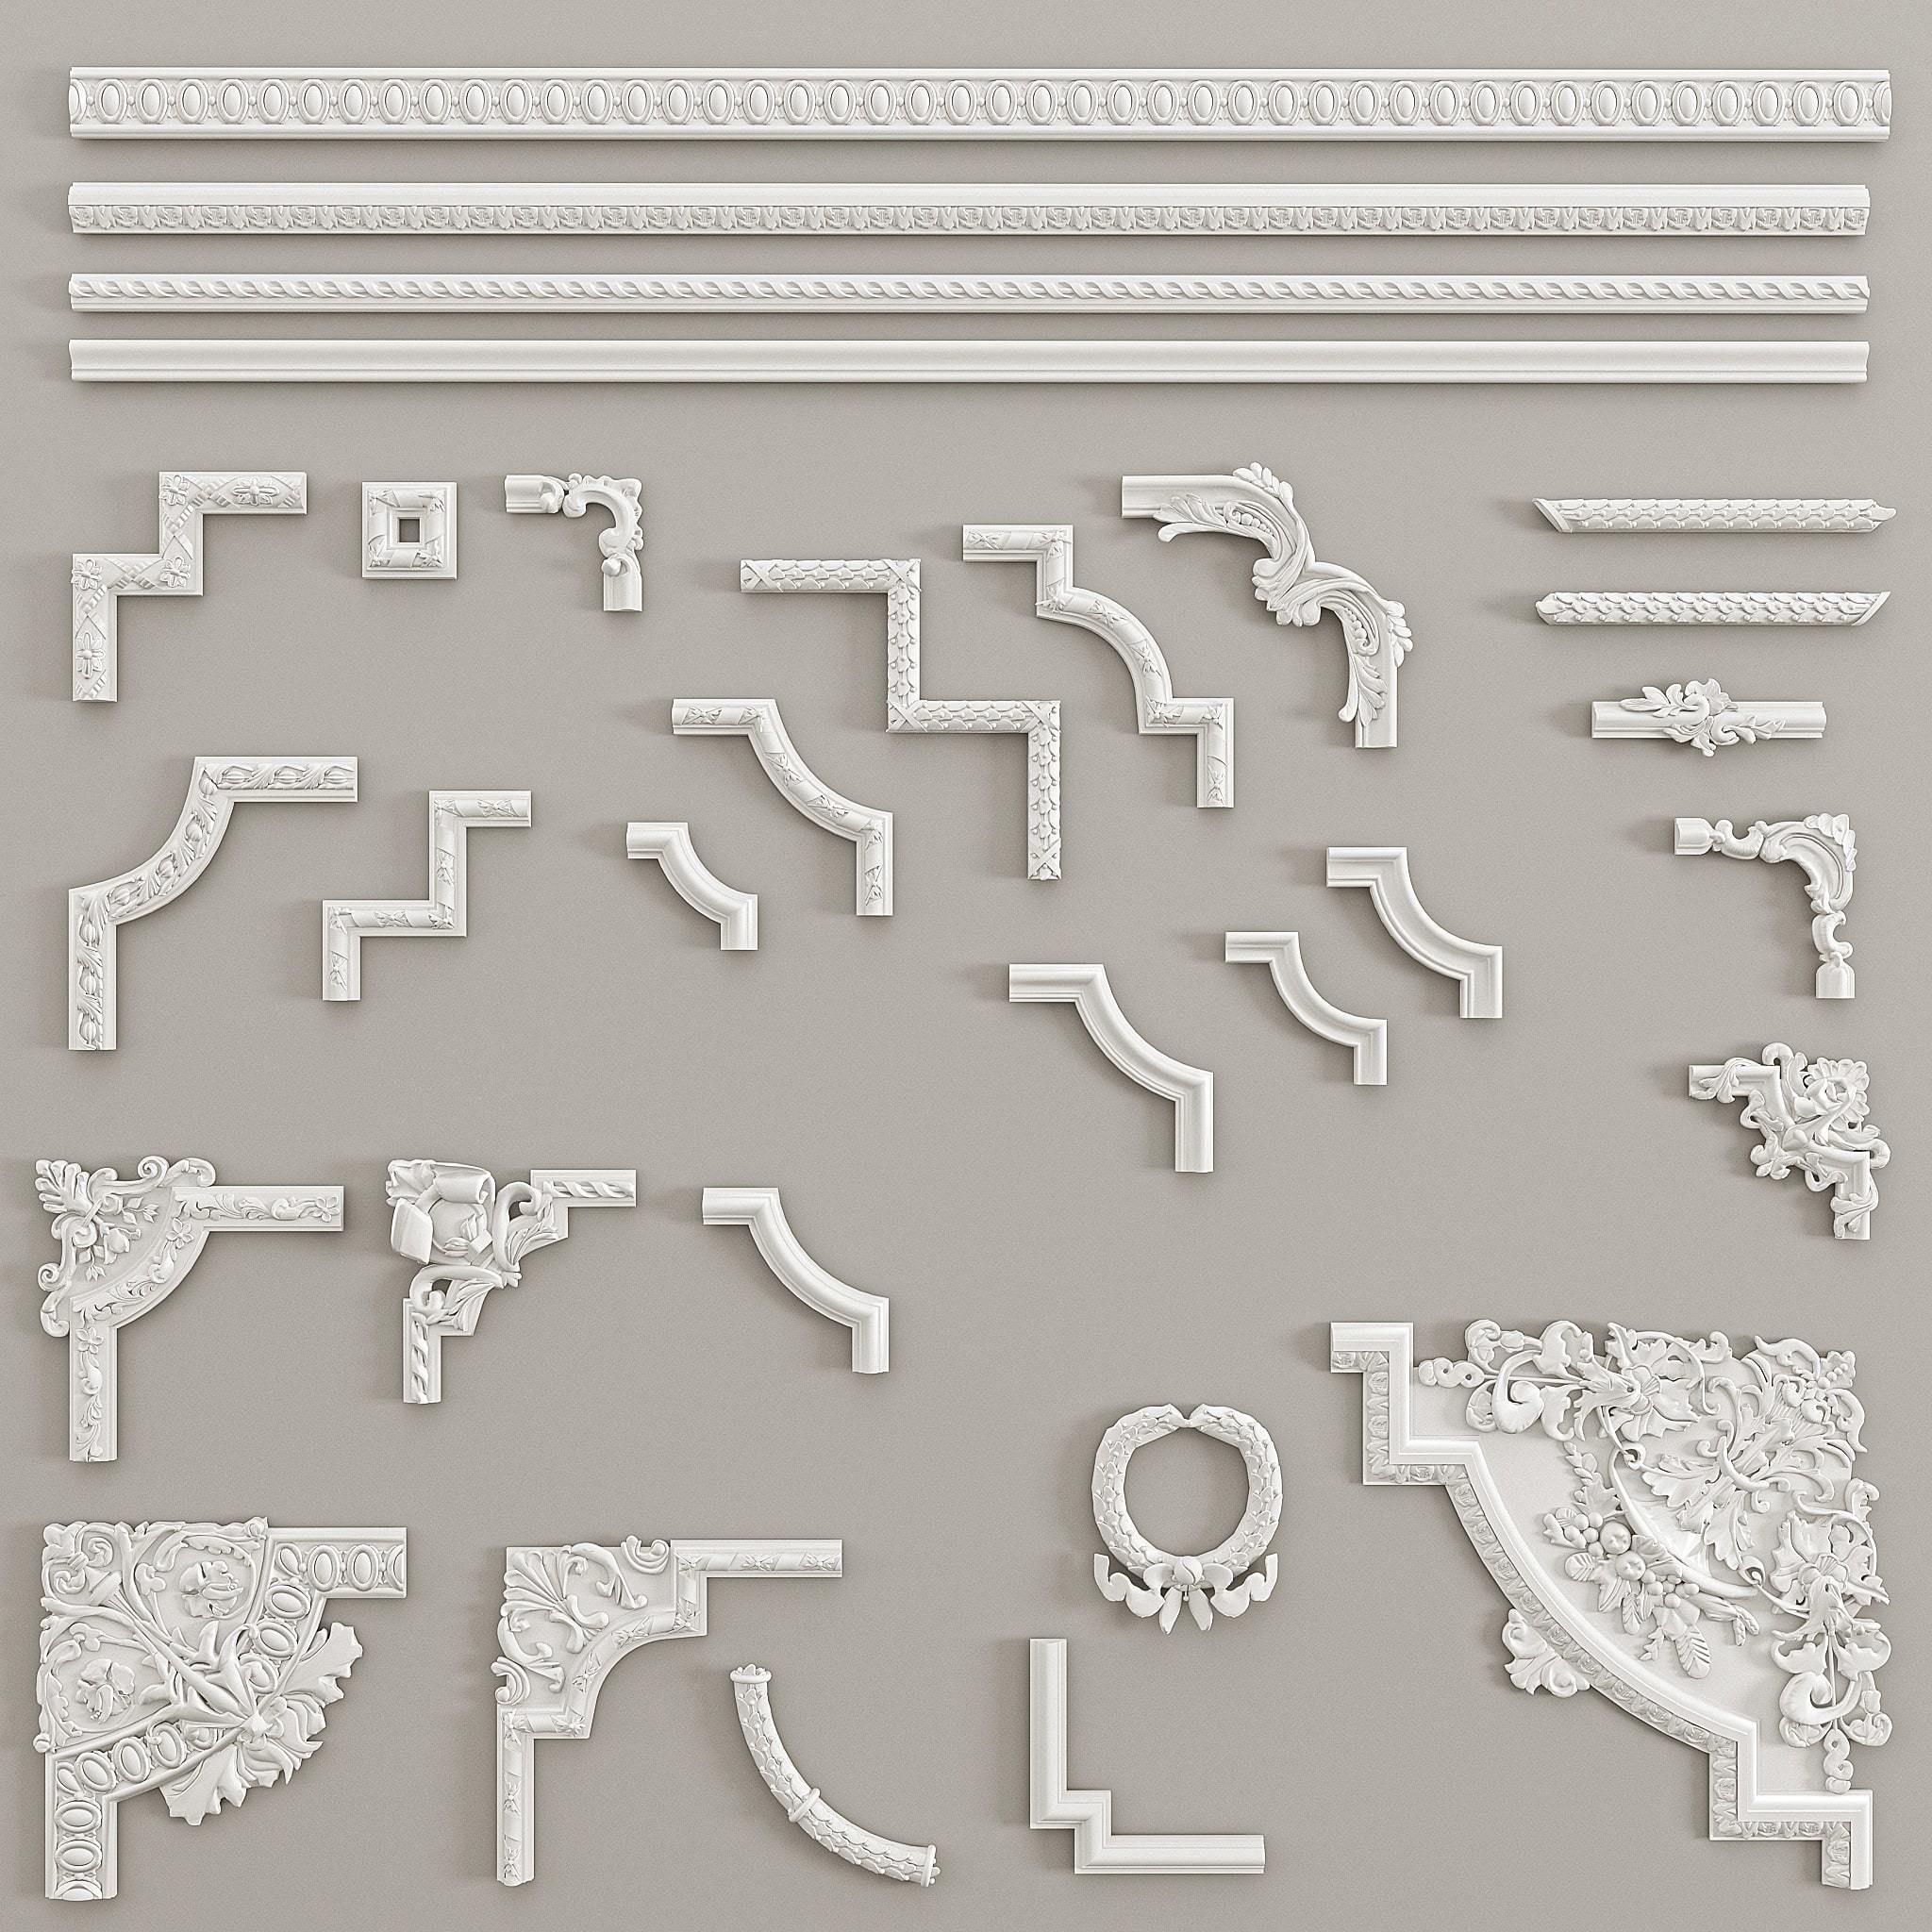 Angular elements and borders Decorative Gaudi Elements